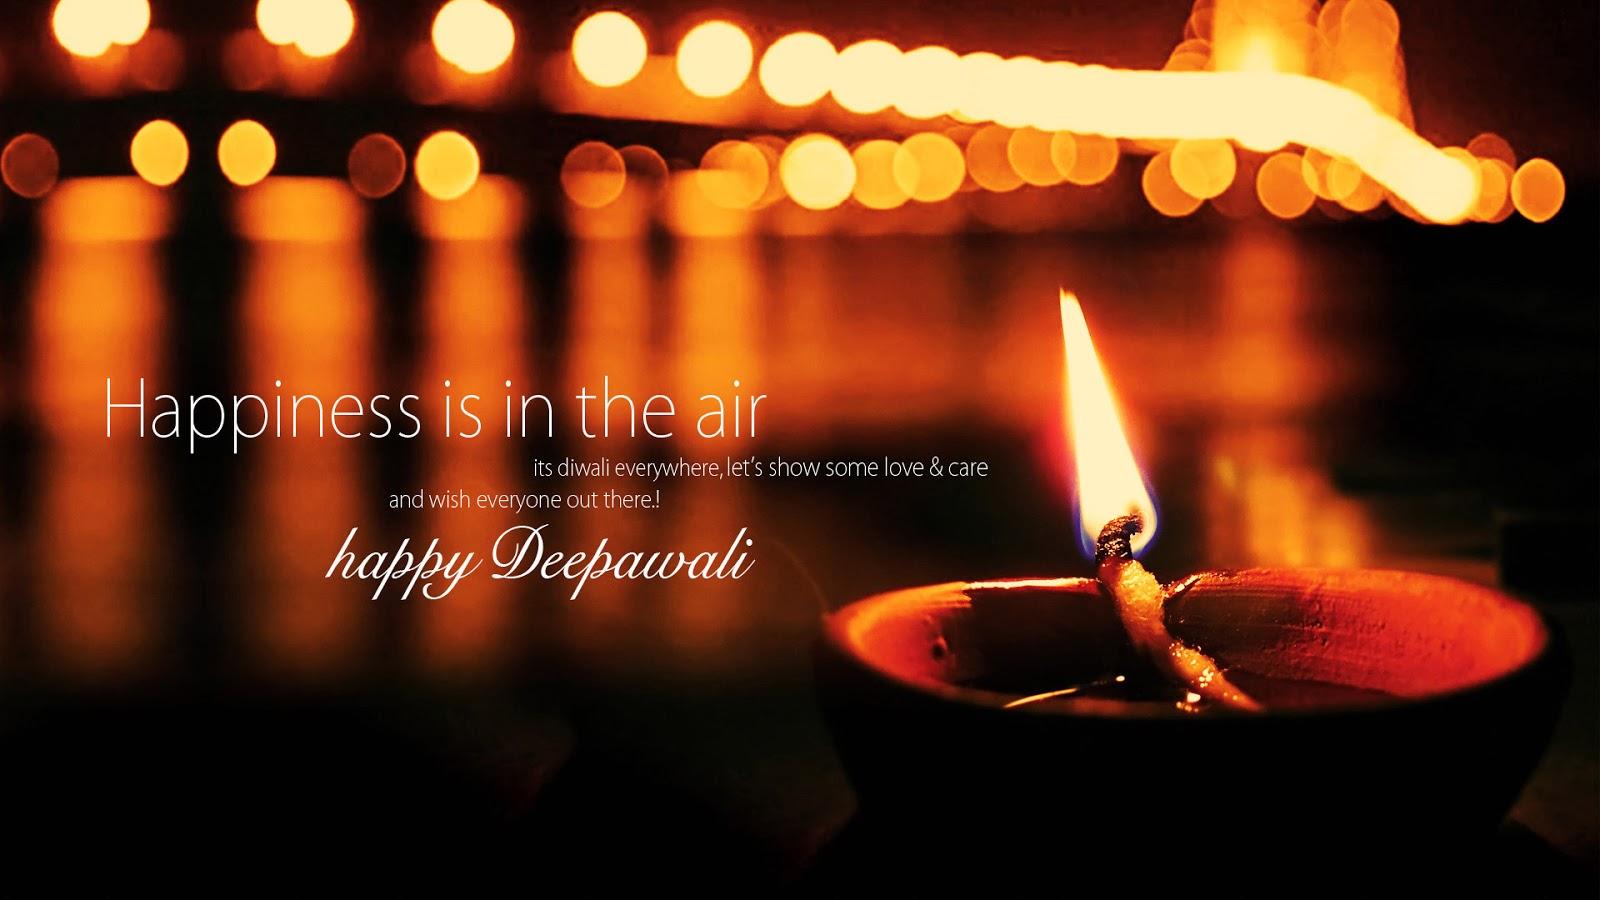 http://3.bp.blogspot.com/-xnrcJHcoRfo/UJT5q6Bt-CI/AAAAAAAAJG0/9WLYyfn1NE4/s1600/diwali-wishes-walllpaers_diwali-greetings-banners-17.jpg